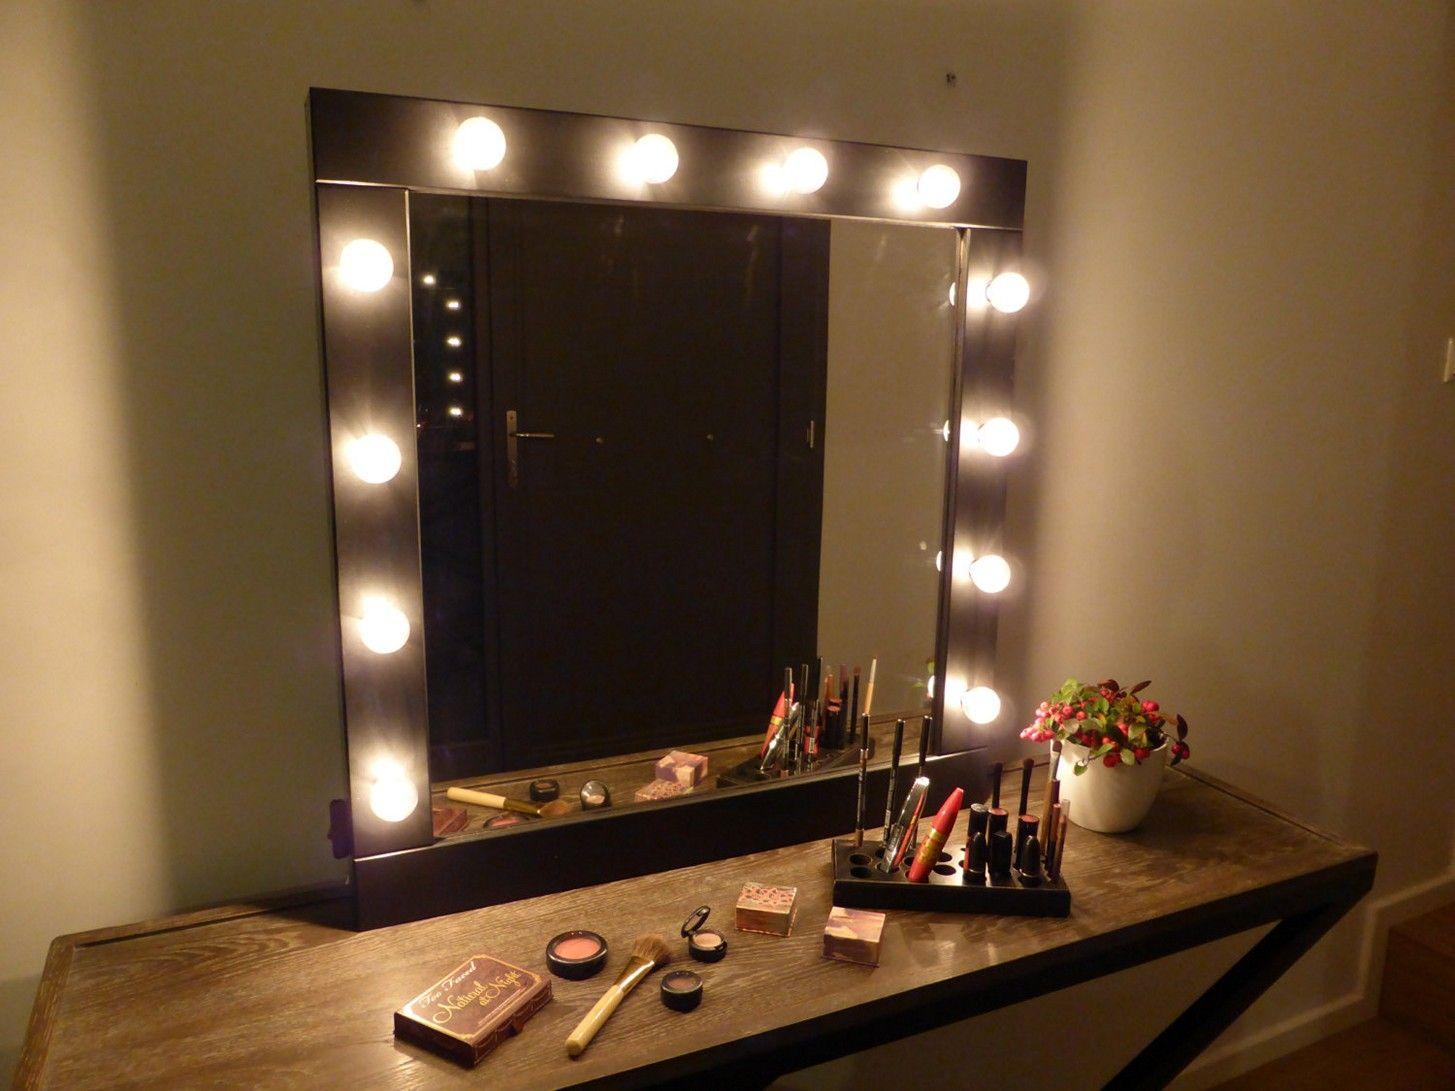 diy makeup vanity mirror with lights images  | room | pinterest